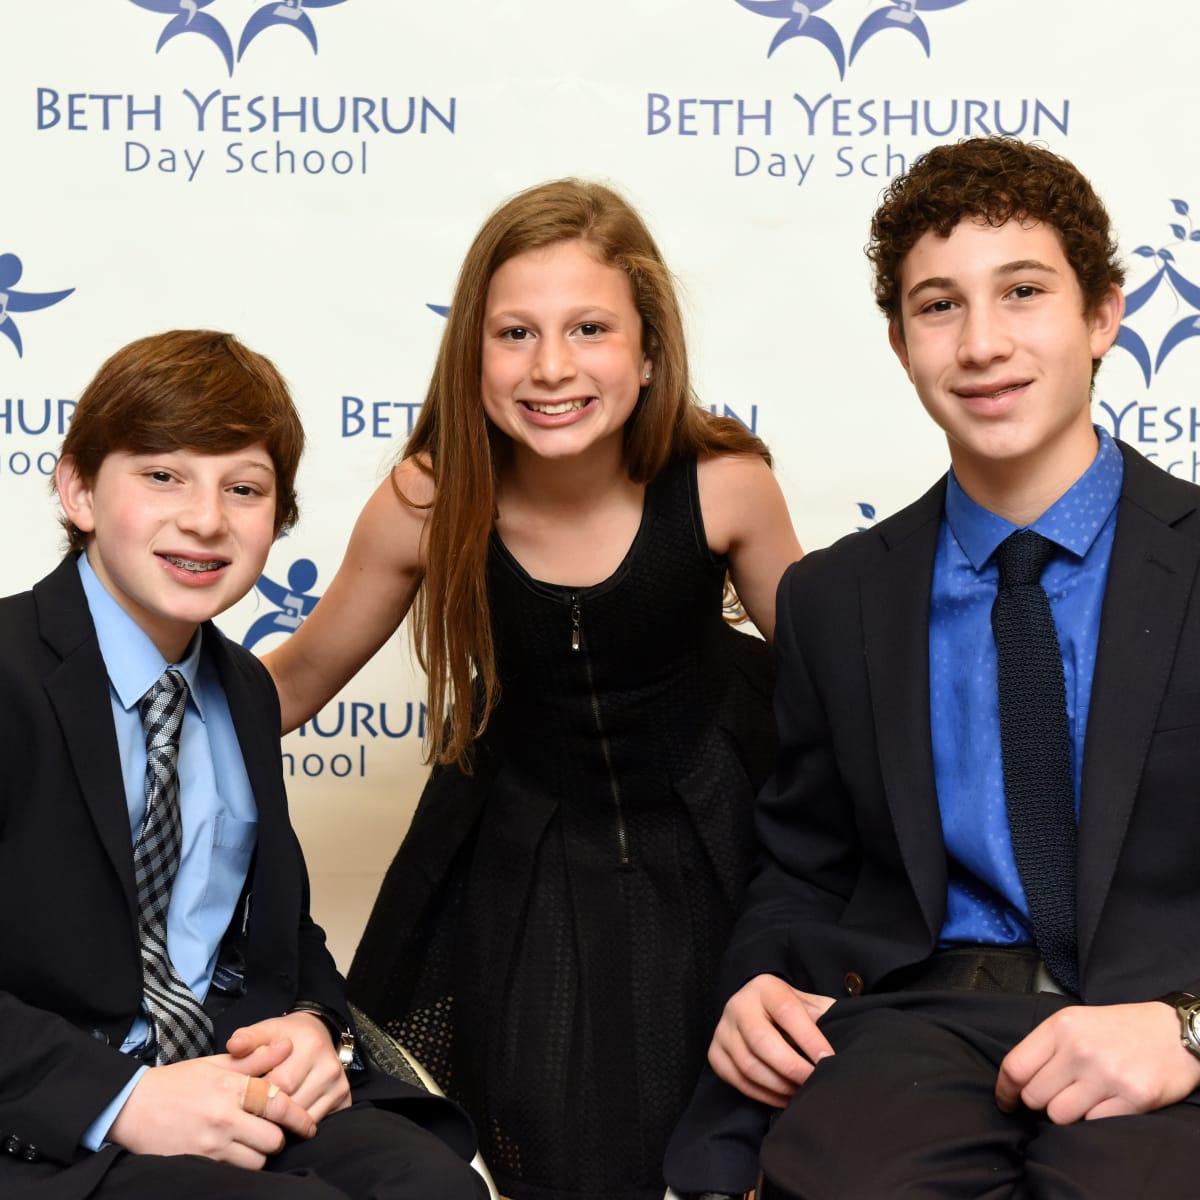 Houston, Beth Yeshurun Day School gala, December 2015, Aaron, Willa and Peter Berry